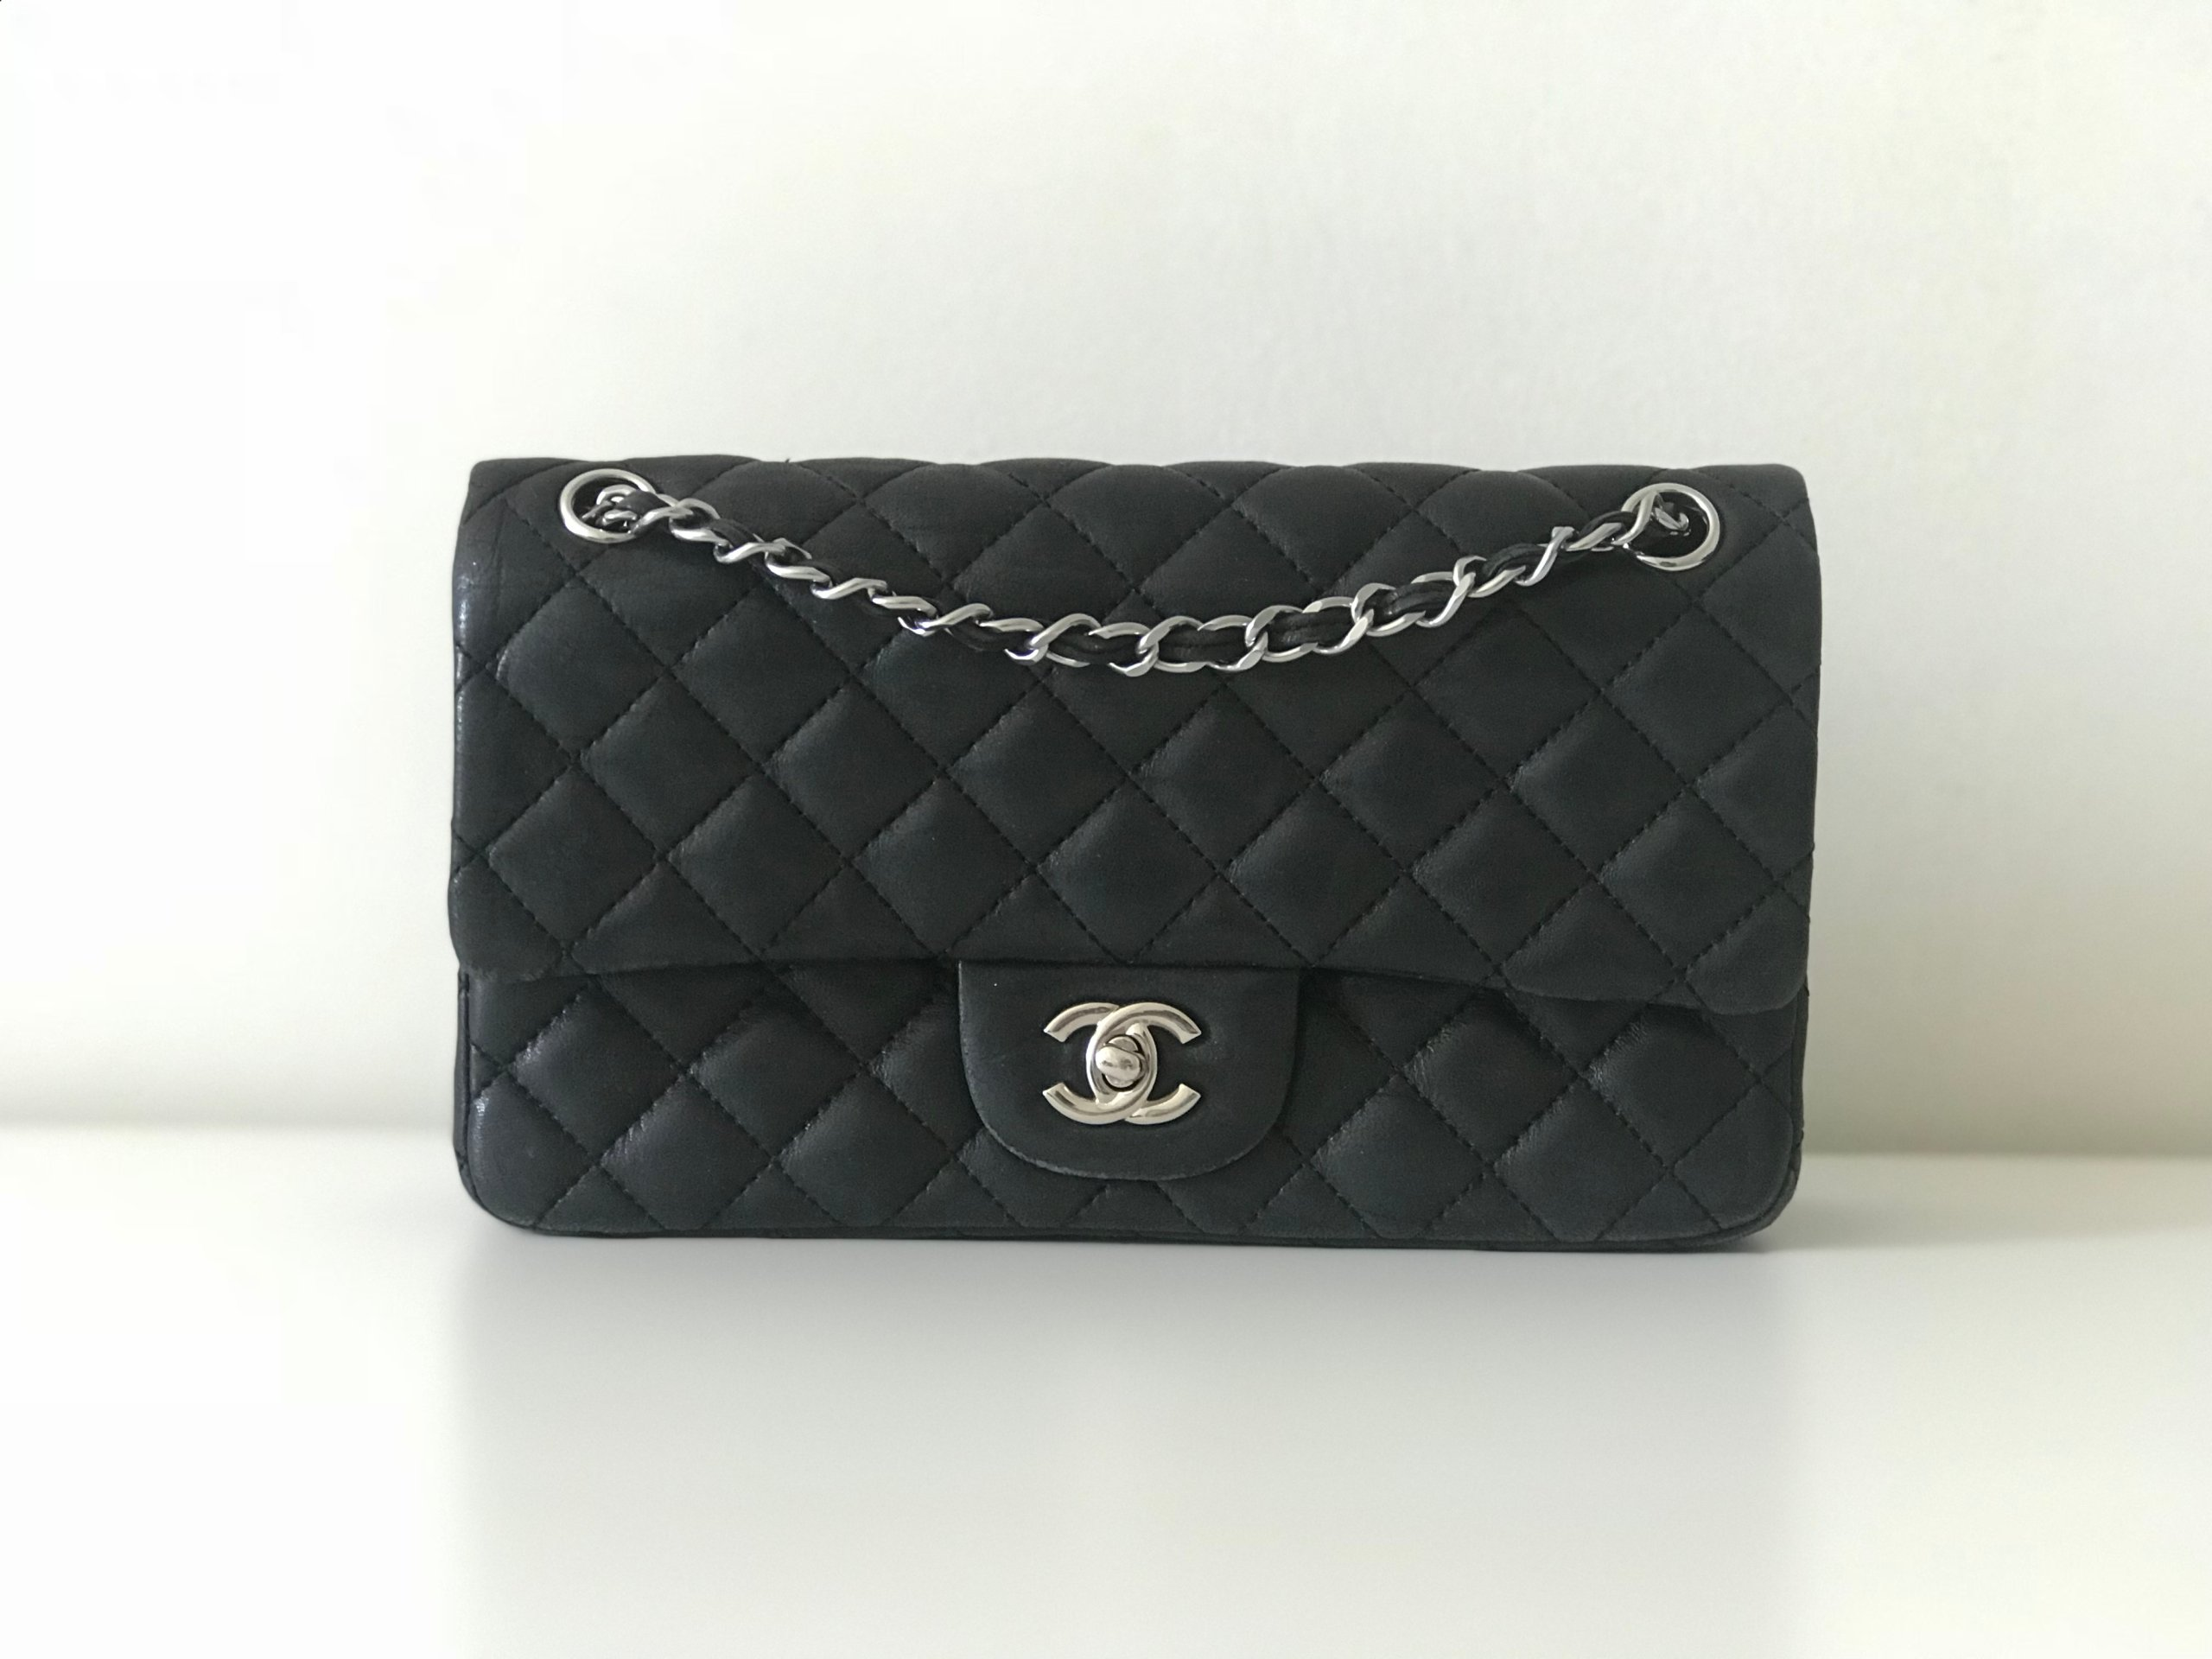 40017a34b6137 Torebka Chanel 2.55 vintage second hand - 7322123659 - oficjalne ...